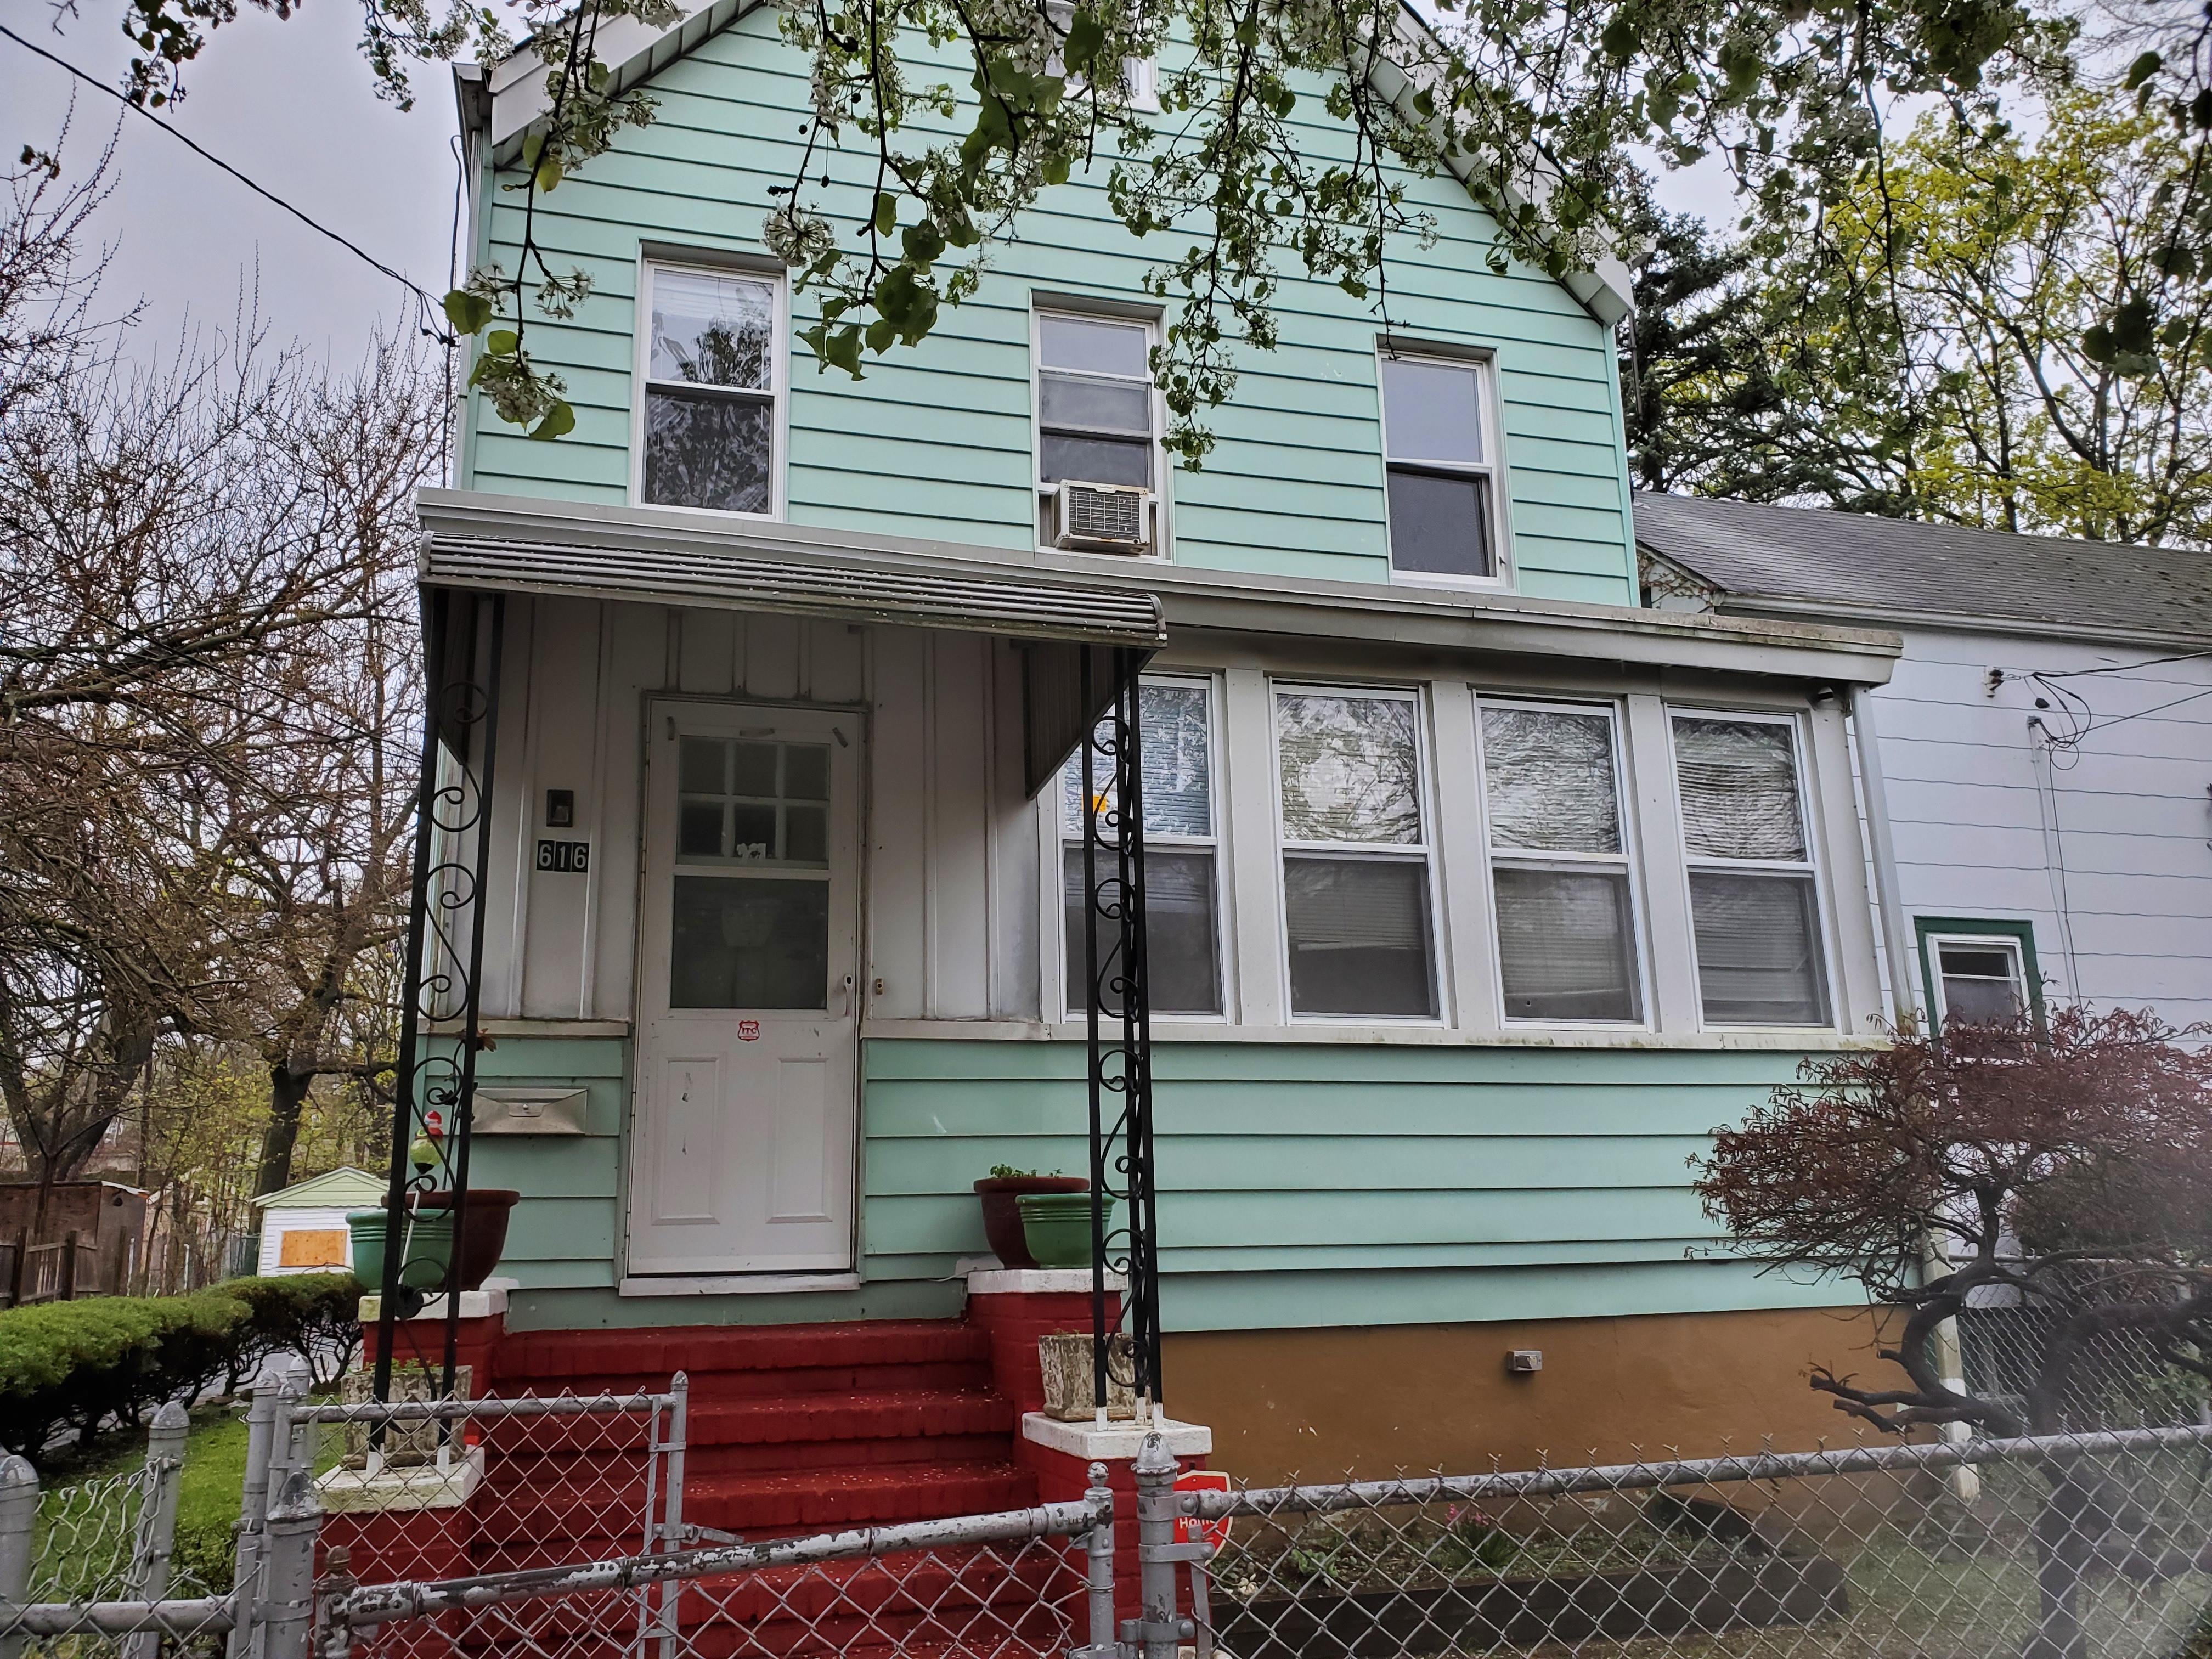 UNDER CONTRACT – 616 LANGDON ST. ORANGE, NJ 07050 $209,900